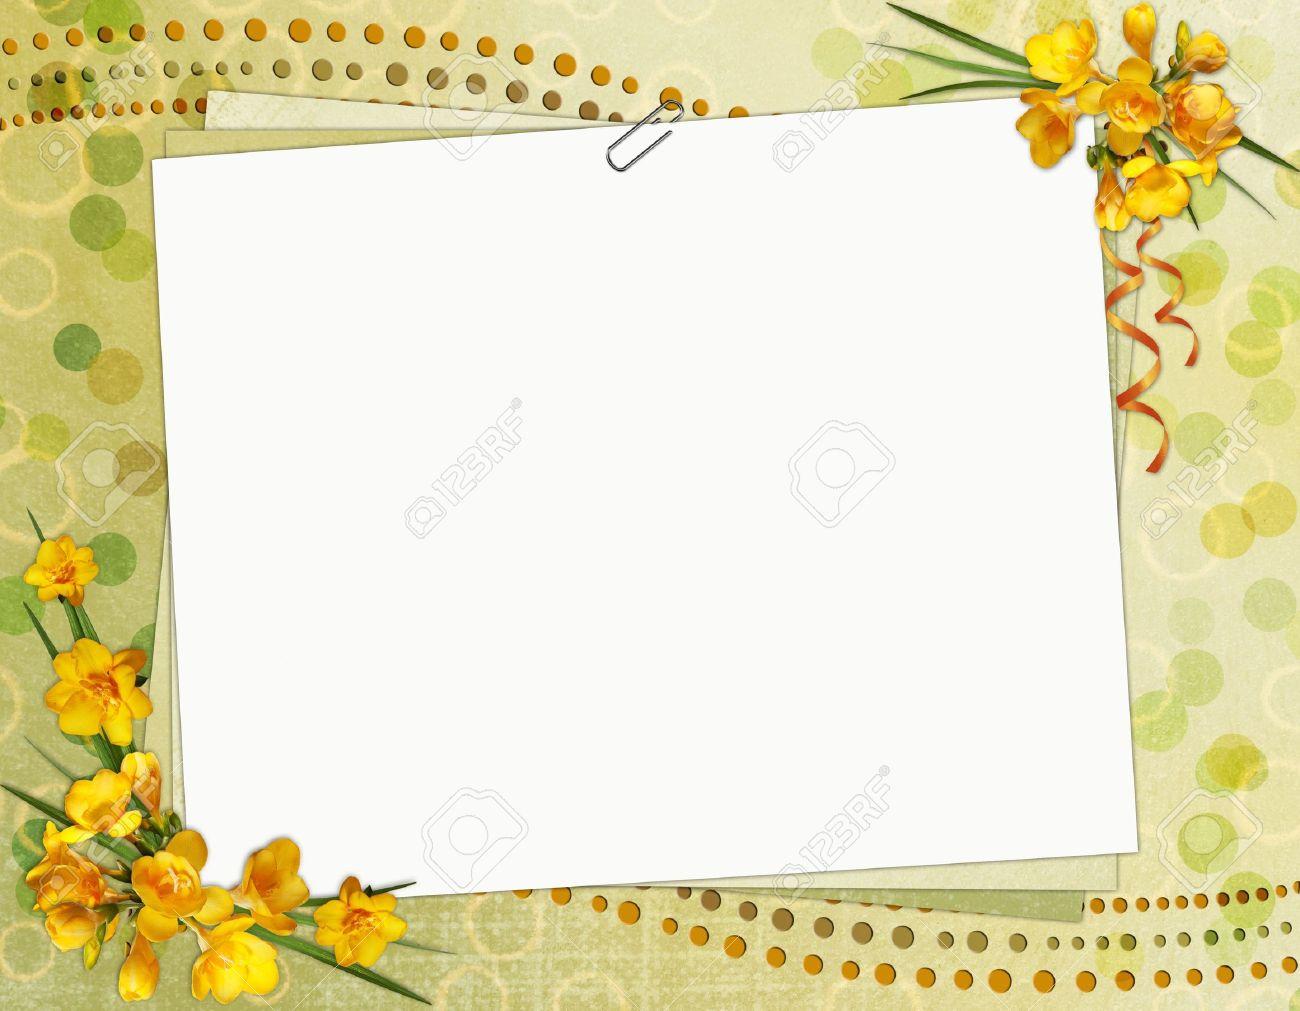 Fantastic Borders For Birthday Invitations Ideas - Invitation Card ...